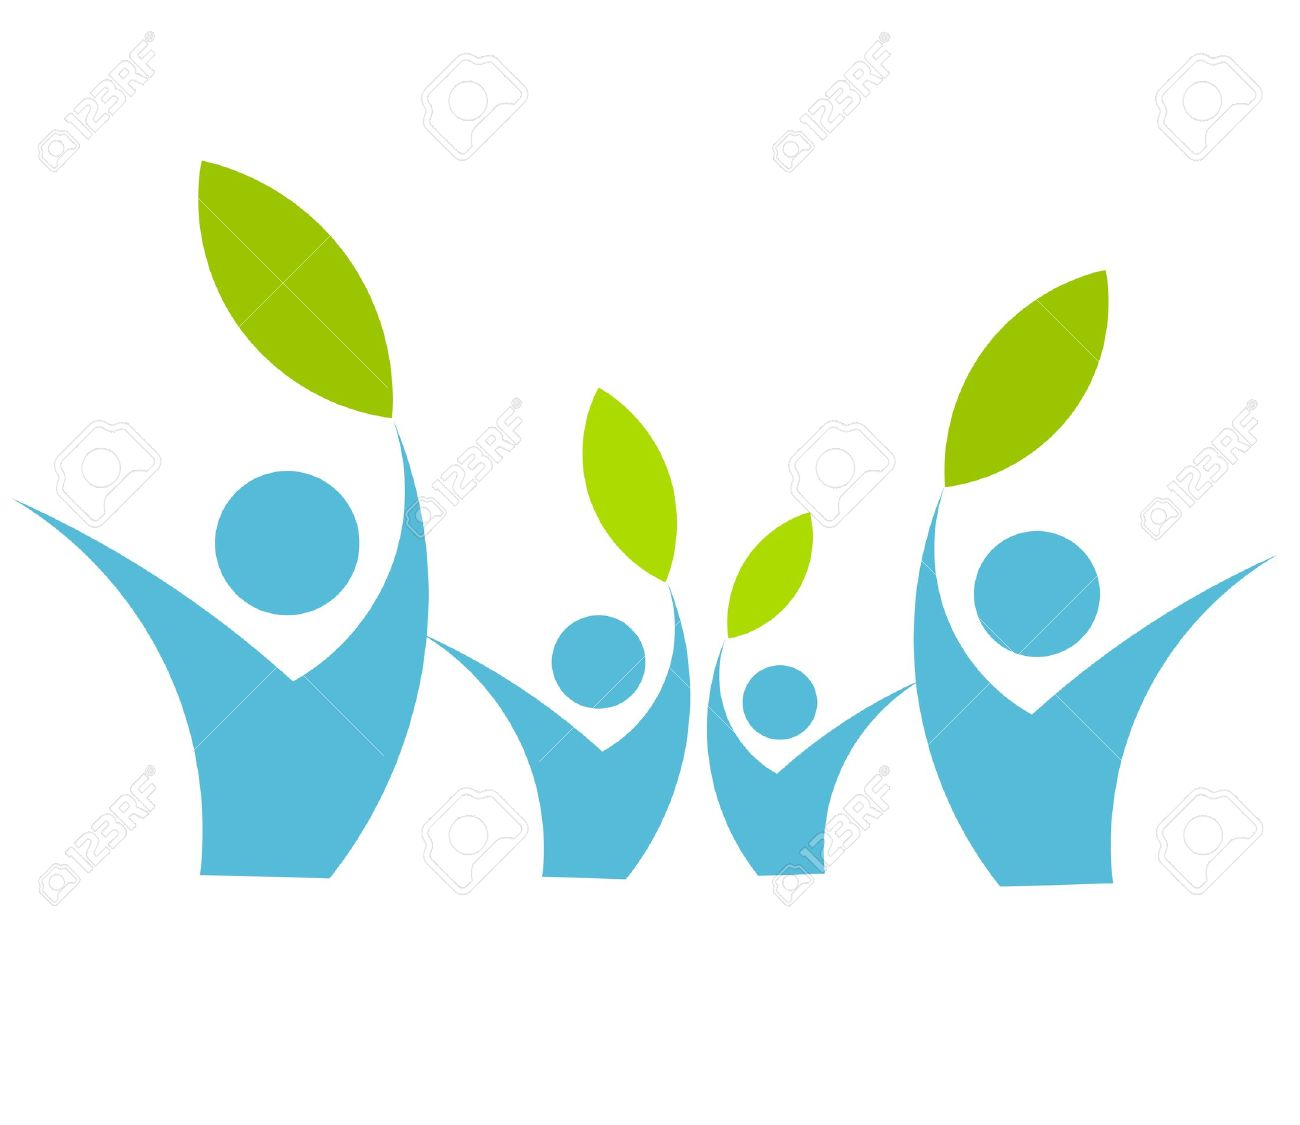 Eco friendly family concept - vector illustration Stock Vector - 12935167